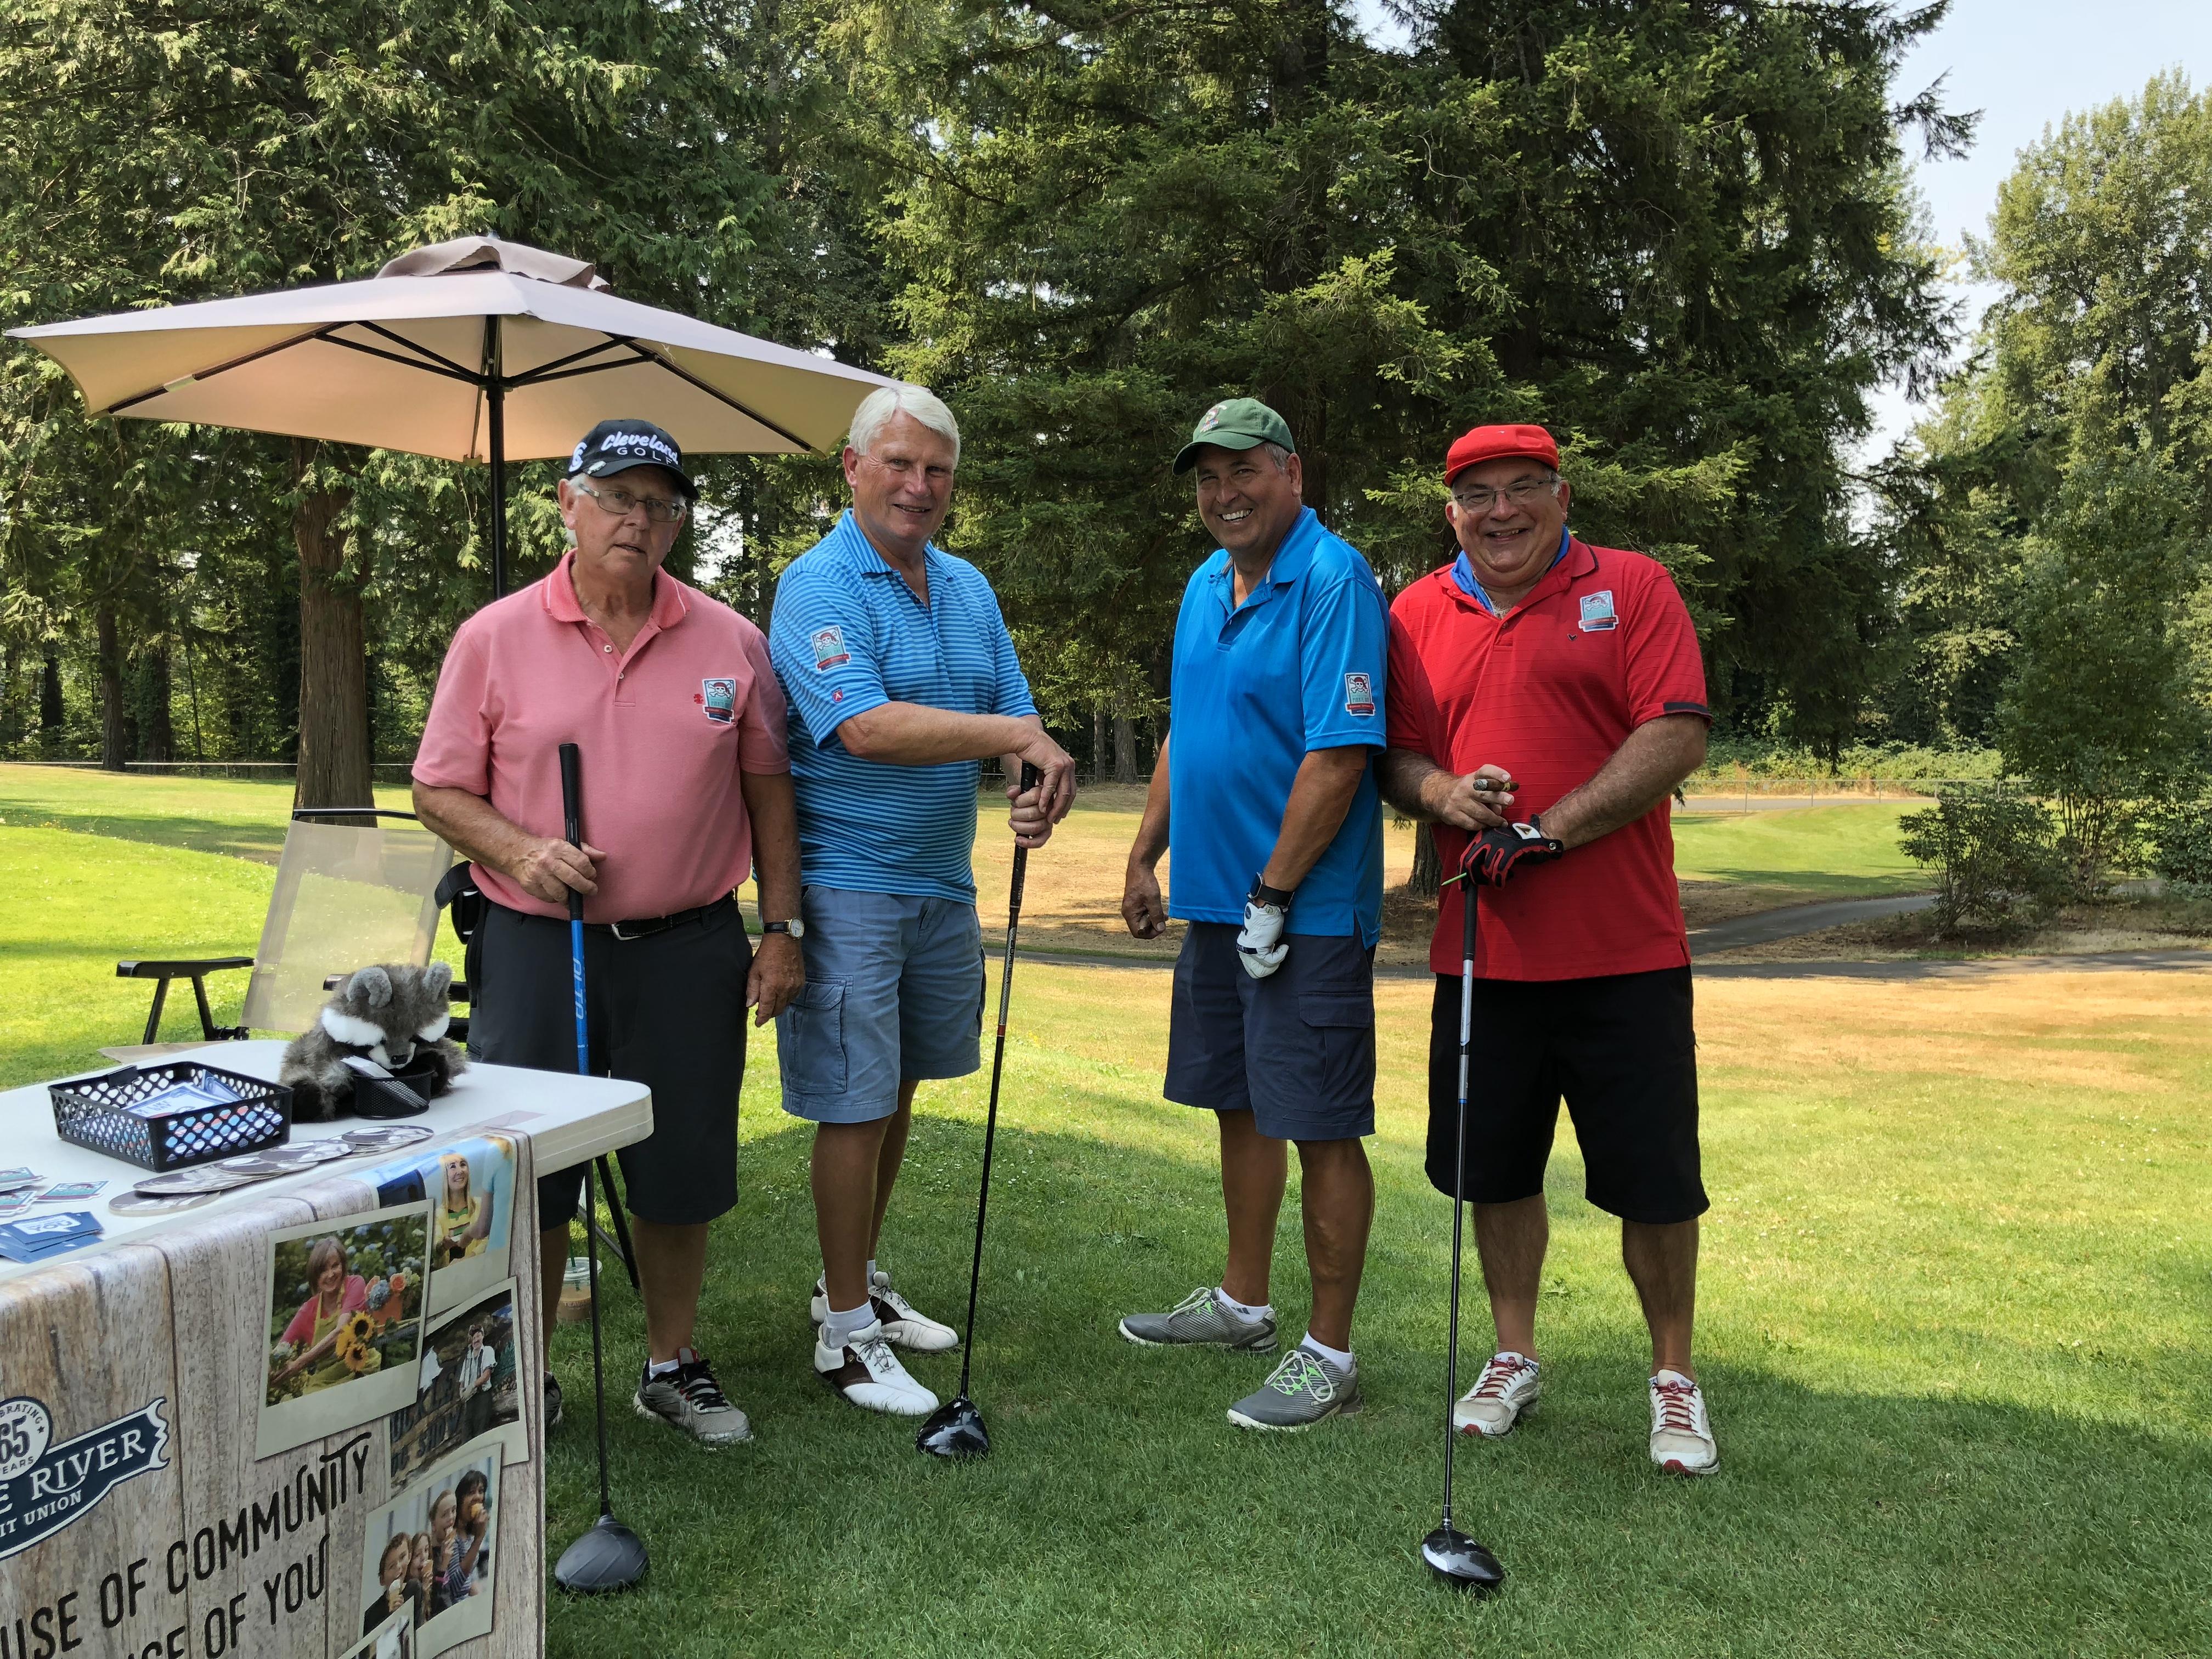 Male golfers standing near WRCU booth